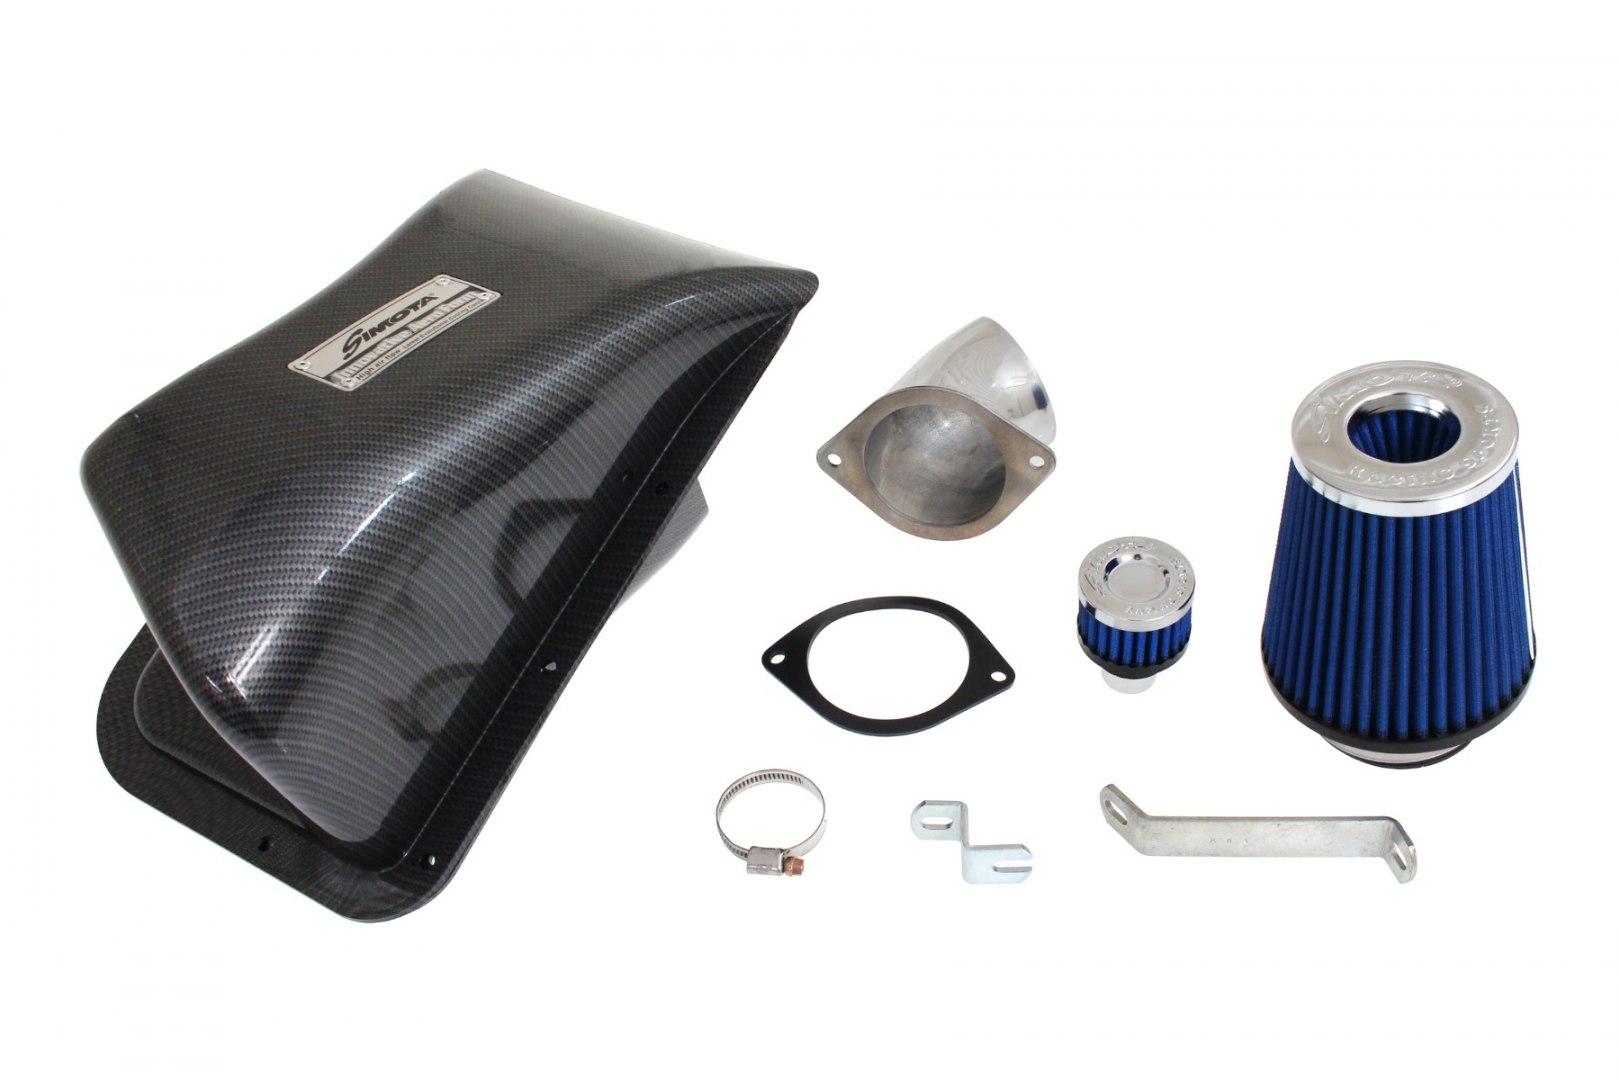 Układ Dolotowy VW Golf IV Bora 2.0 98-03 Aero Form PTS-806 - GRUBYGARAGE - Sklep Tuningowy